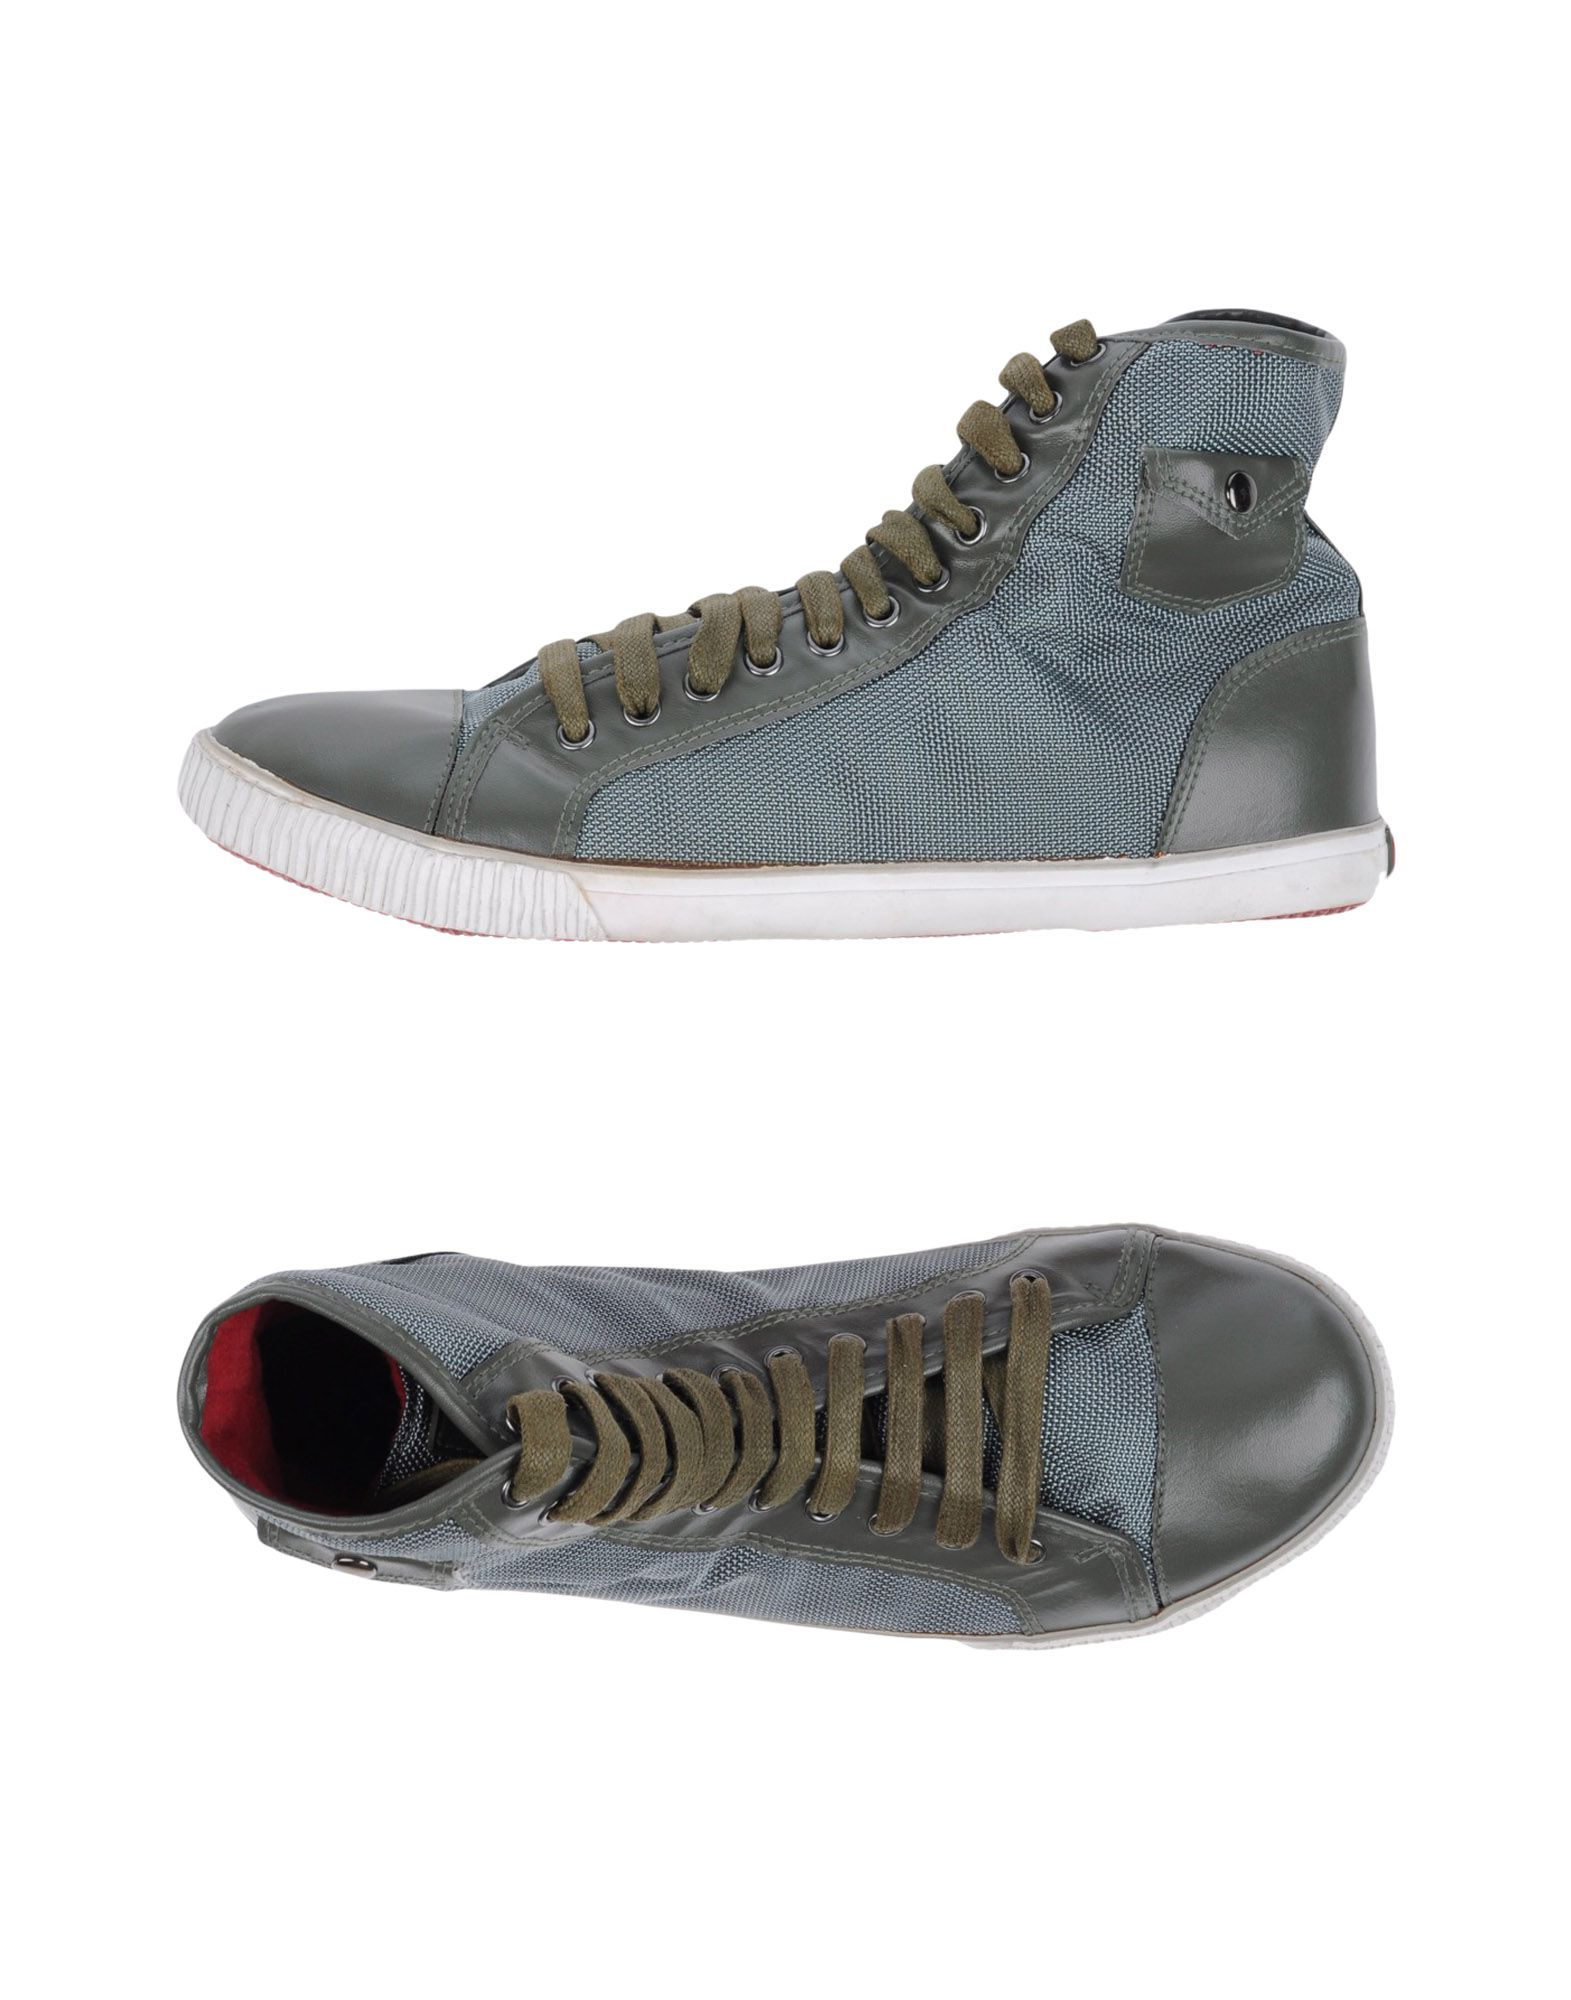 DID Высокие кеды и кроссовки кеды кроссовки высокие dc council mid tx stone camo